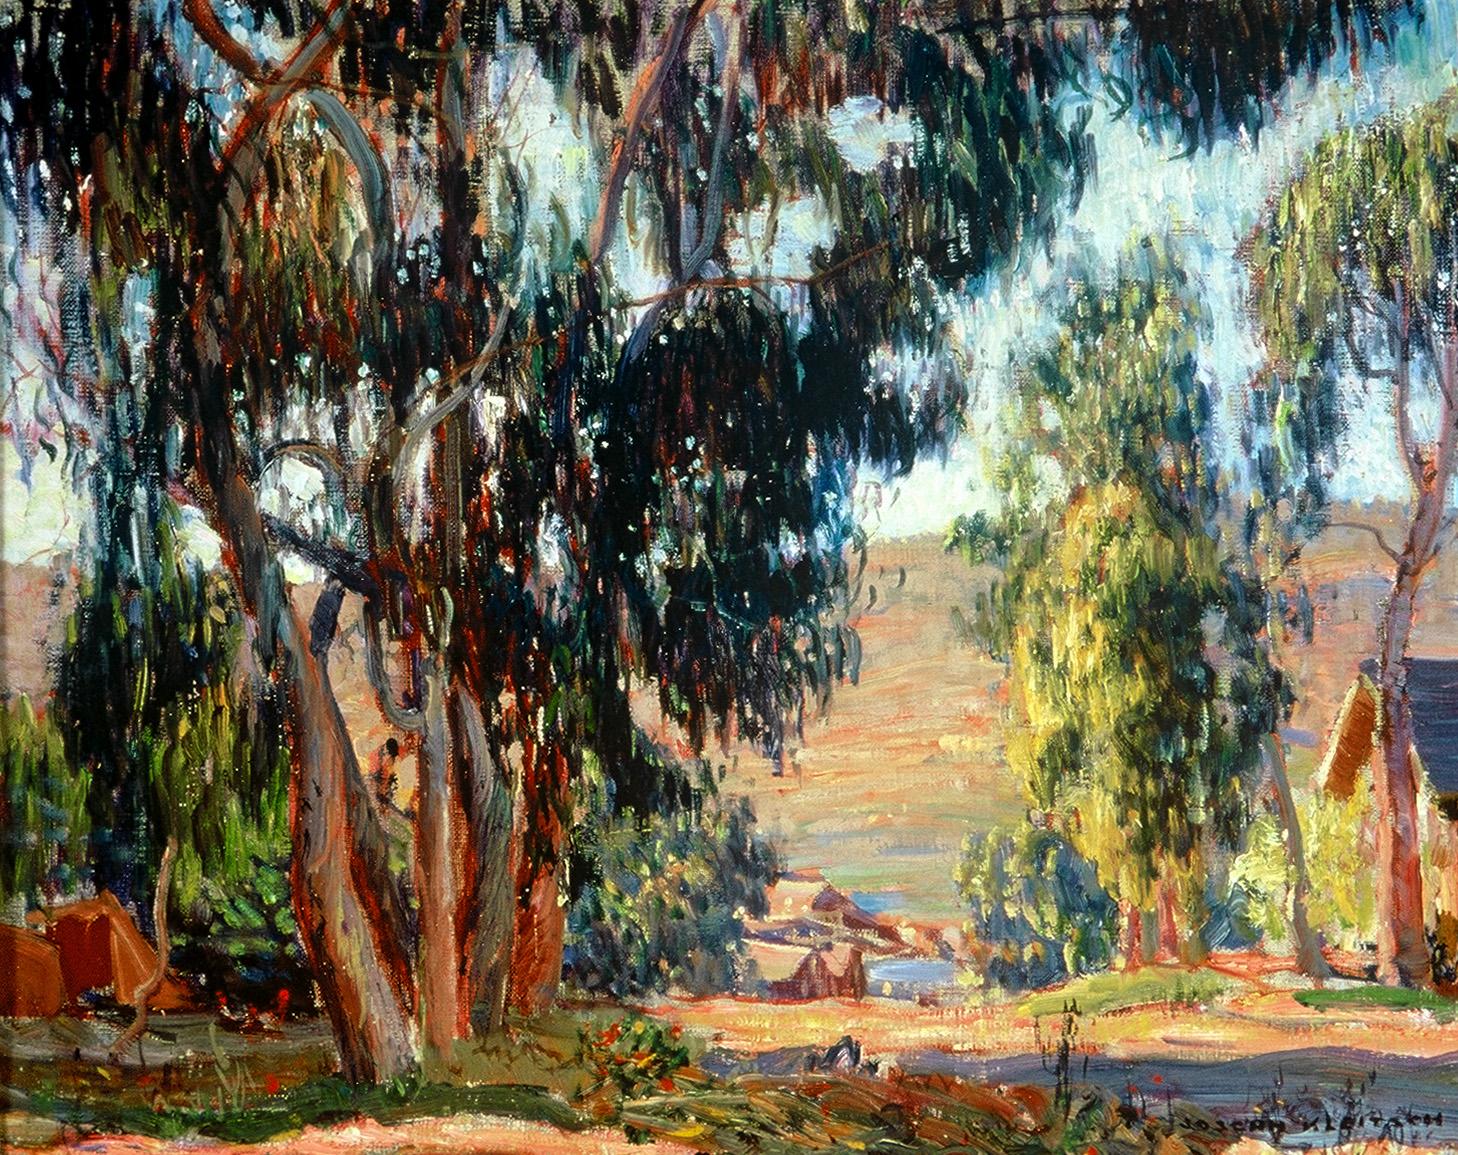 """Glenneyre Street, Laguna Beach,""  circa 1924 by Joseph Kleitsch Courtesy of The Irvine Museum"